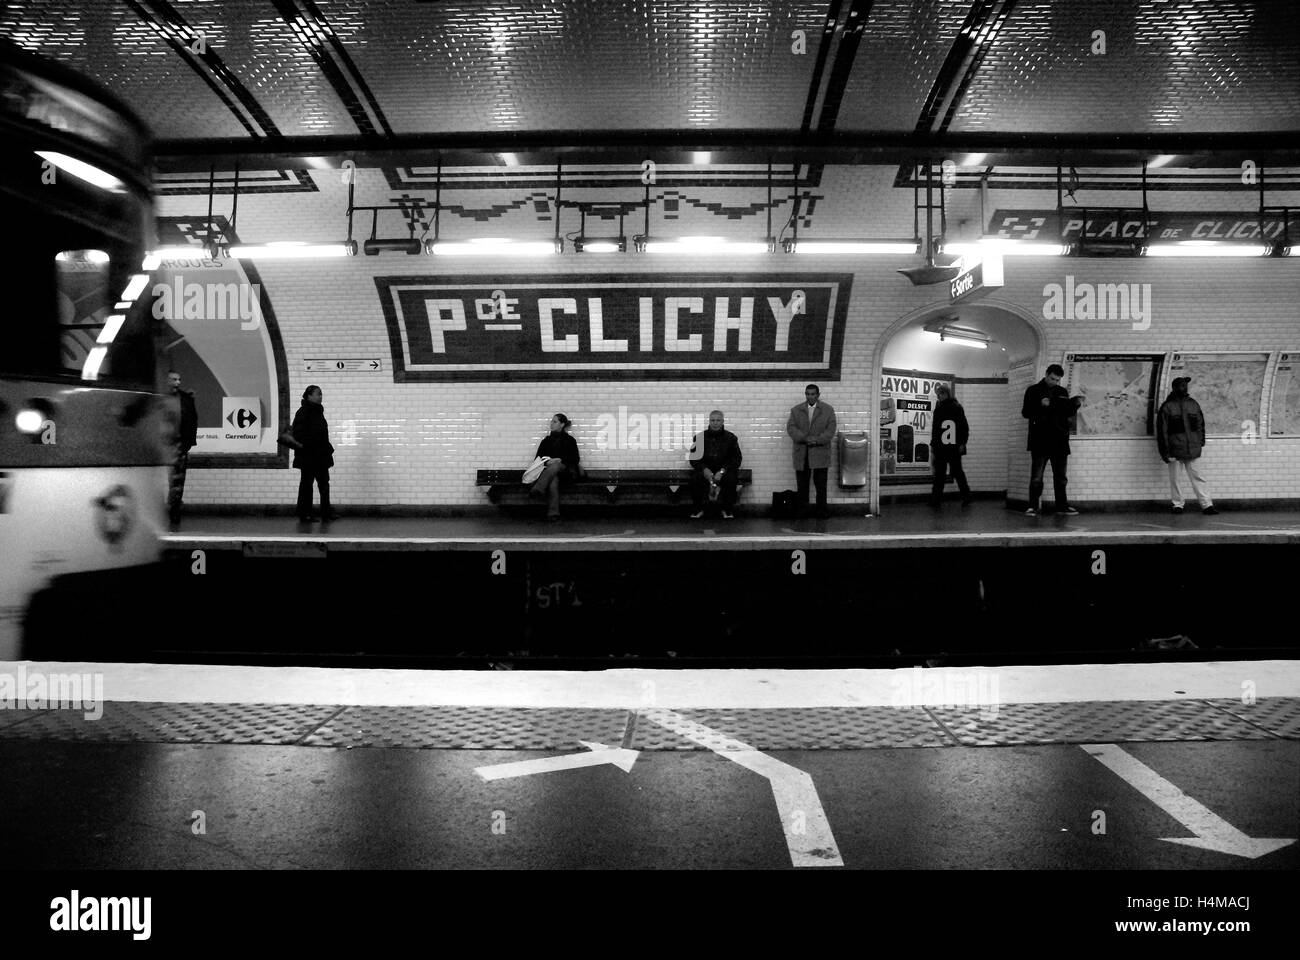 Street Clichy Paris Stock Photos & Street Clichy Paris Stock Images ...